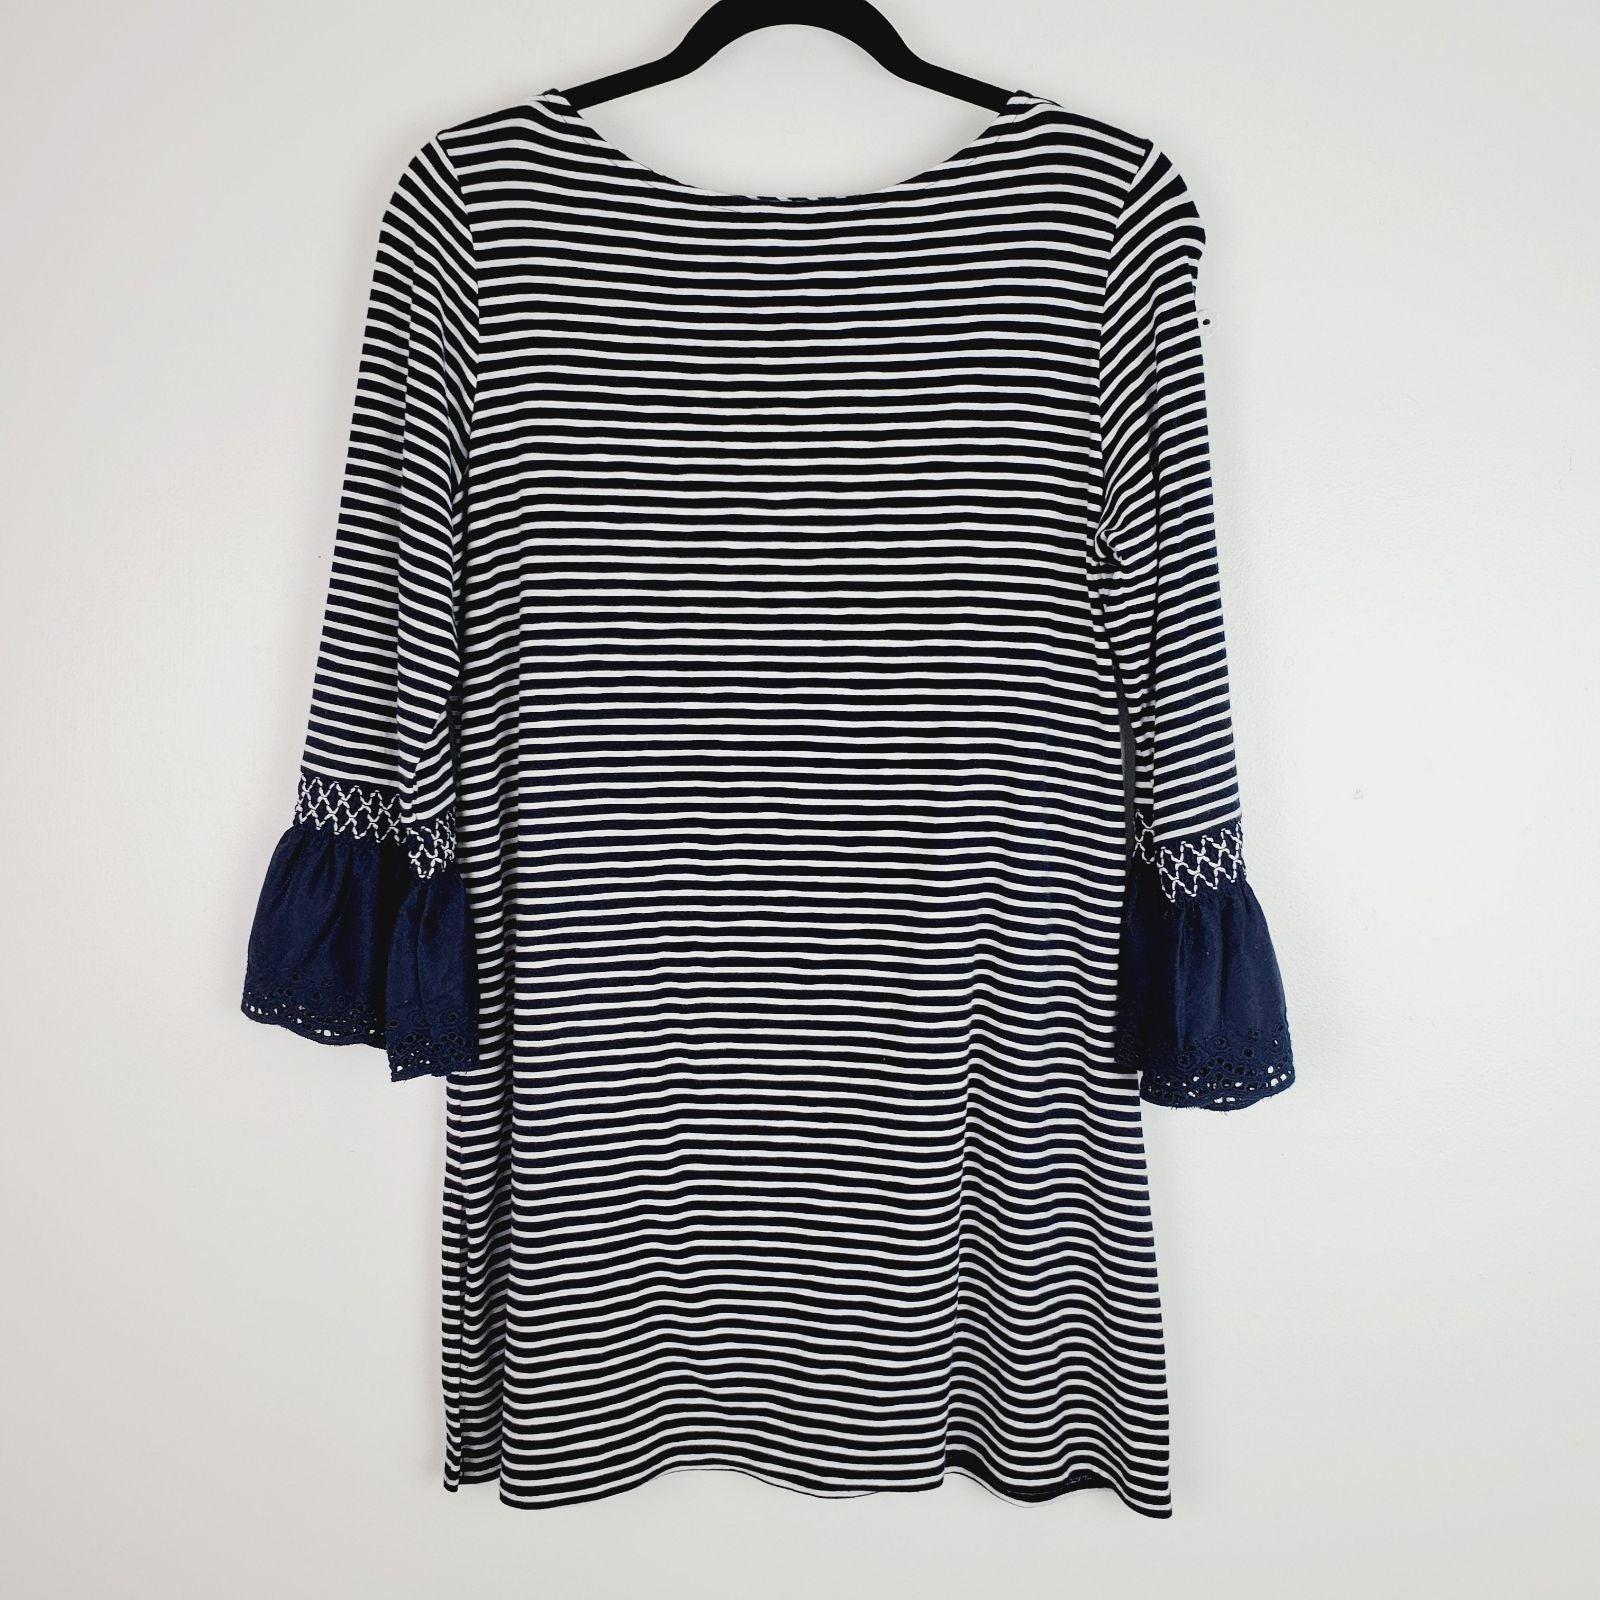 J.Jill Navy & White Striped Tunic